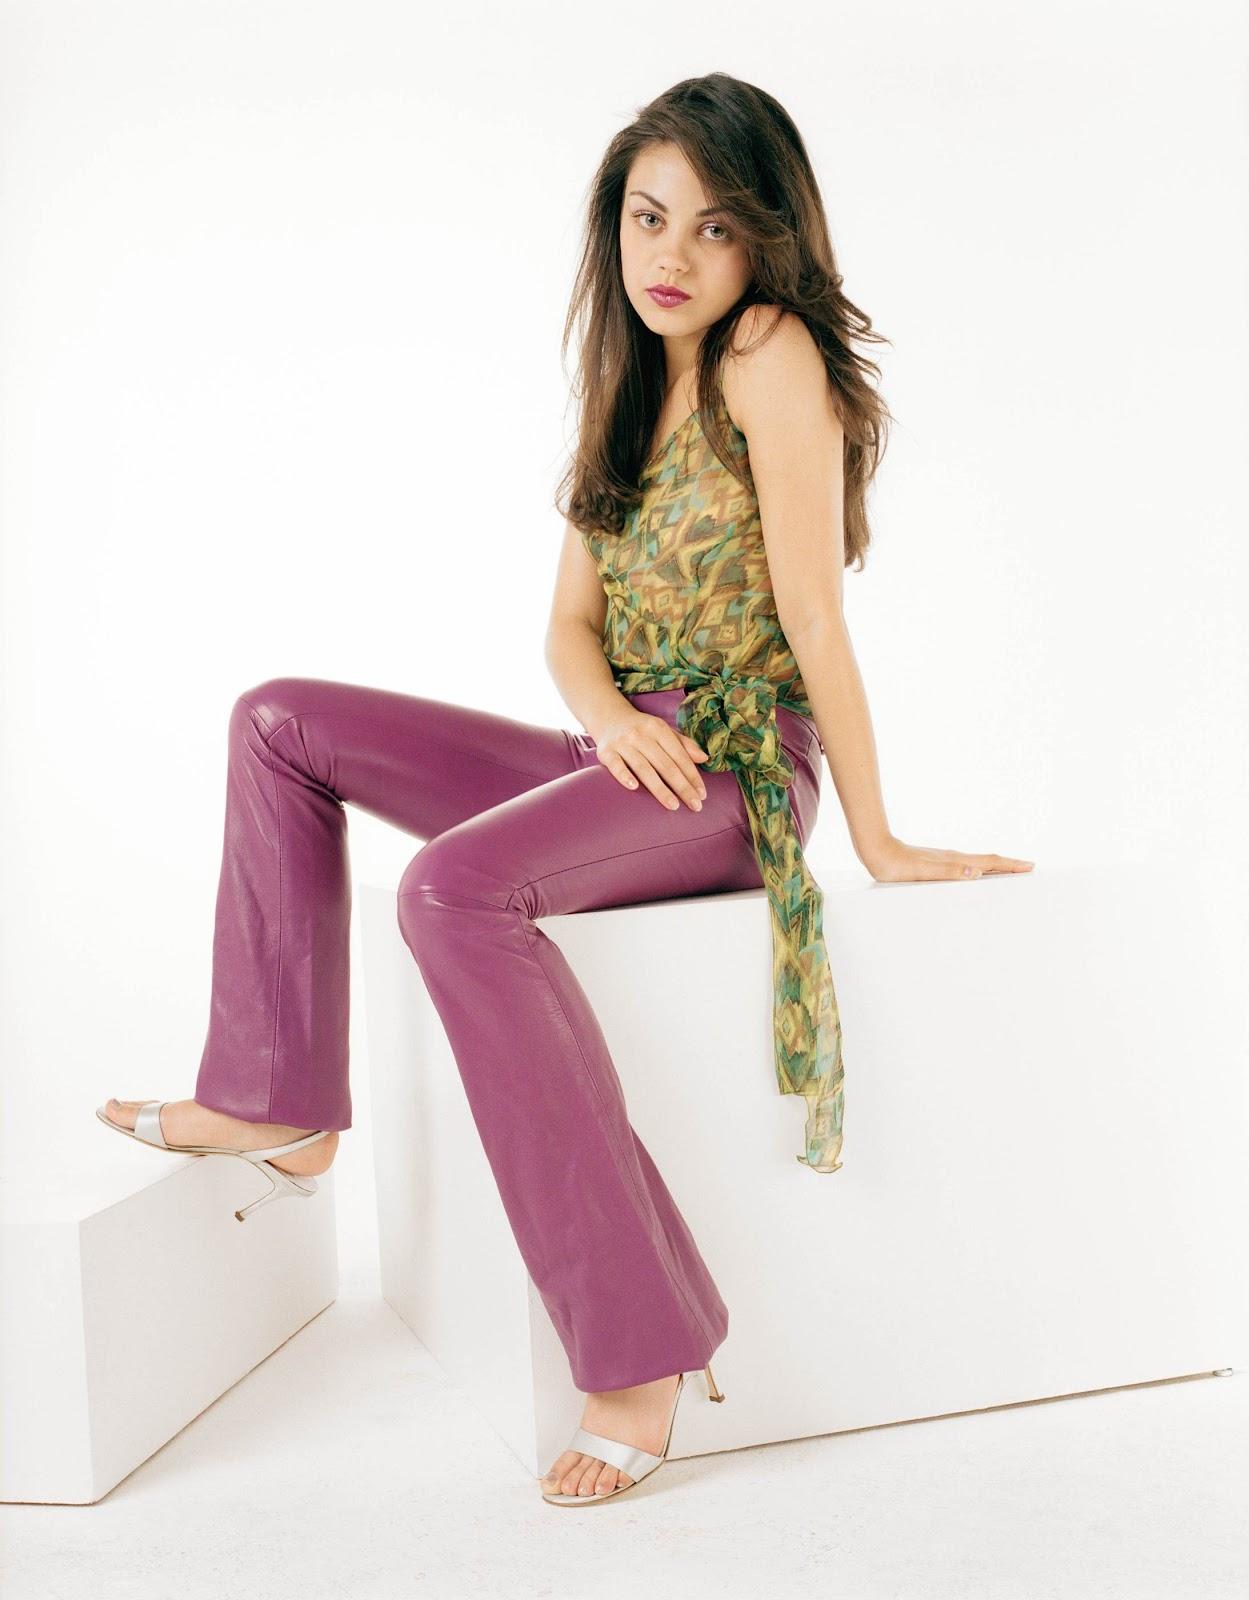 http://3.bp.blogspot.com/-cD3cSeUtj8k/T307U3FJttI/AAAAAAAAEco/iHixIwKIKYM/s1600/Mila_Kunis_Feet_1.jpg